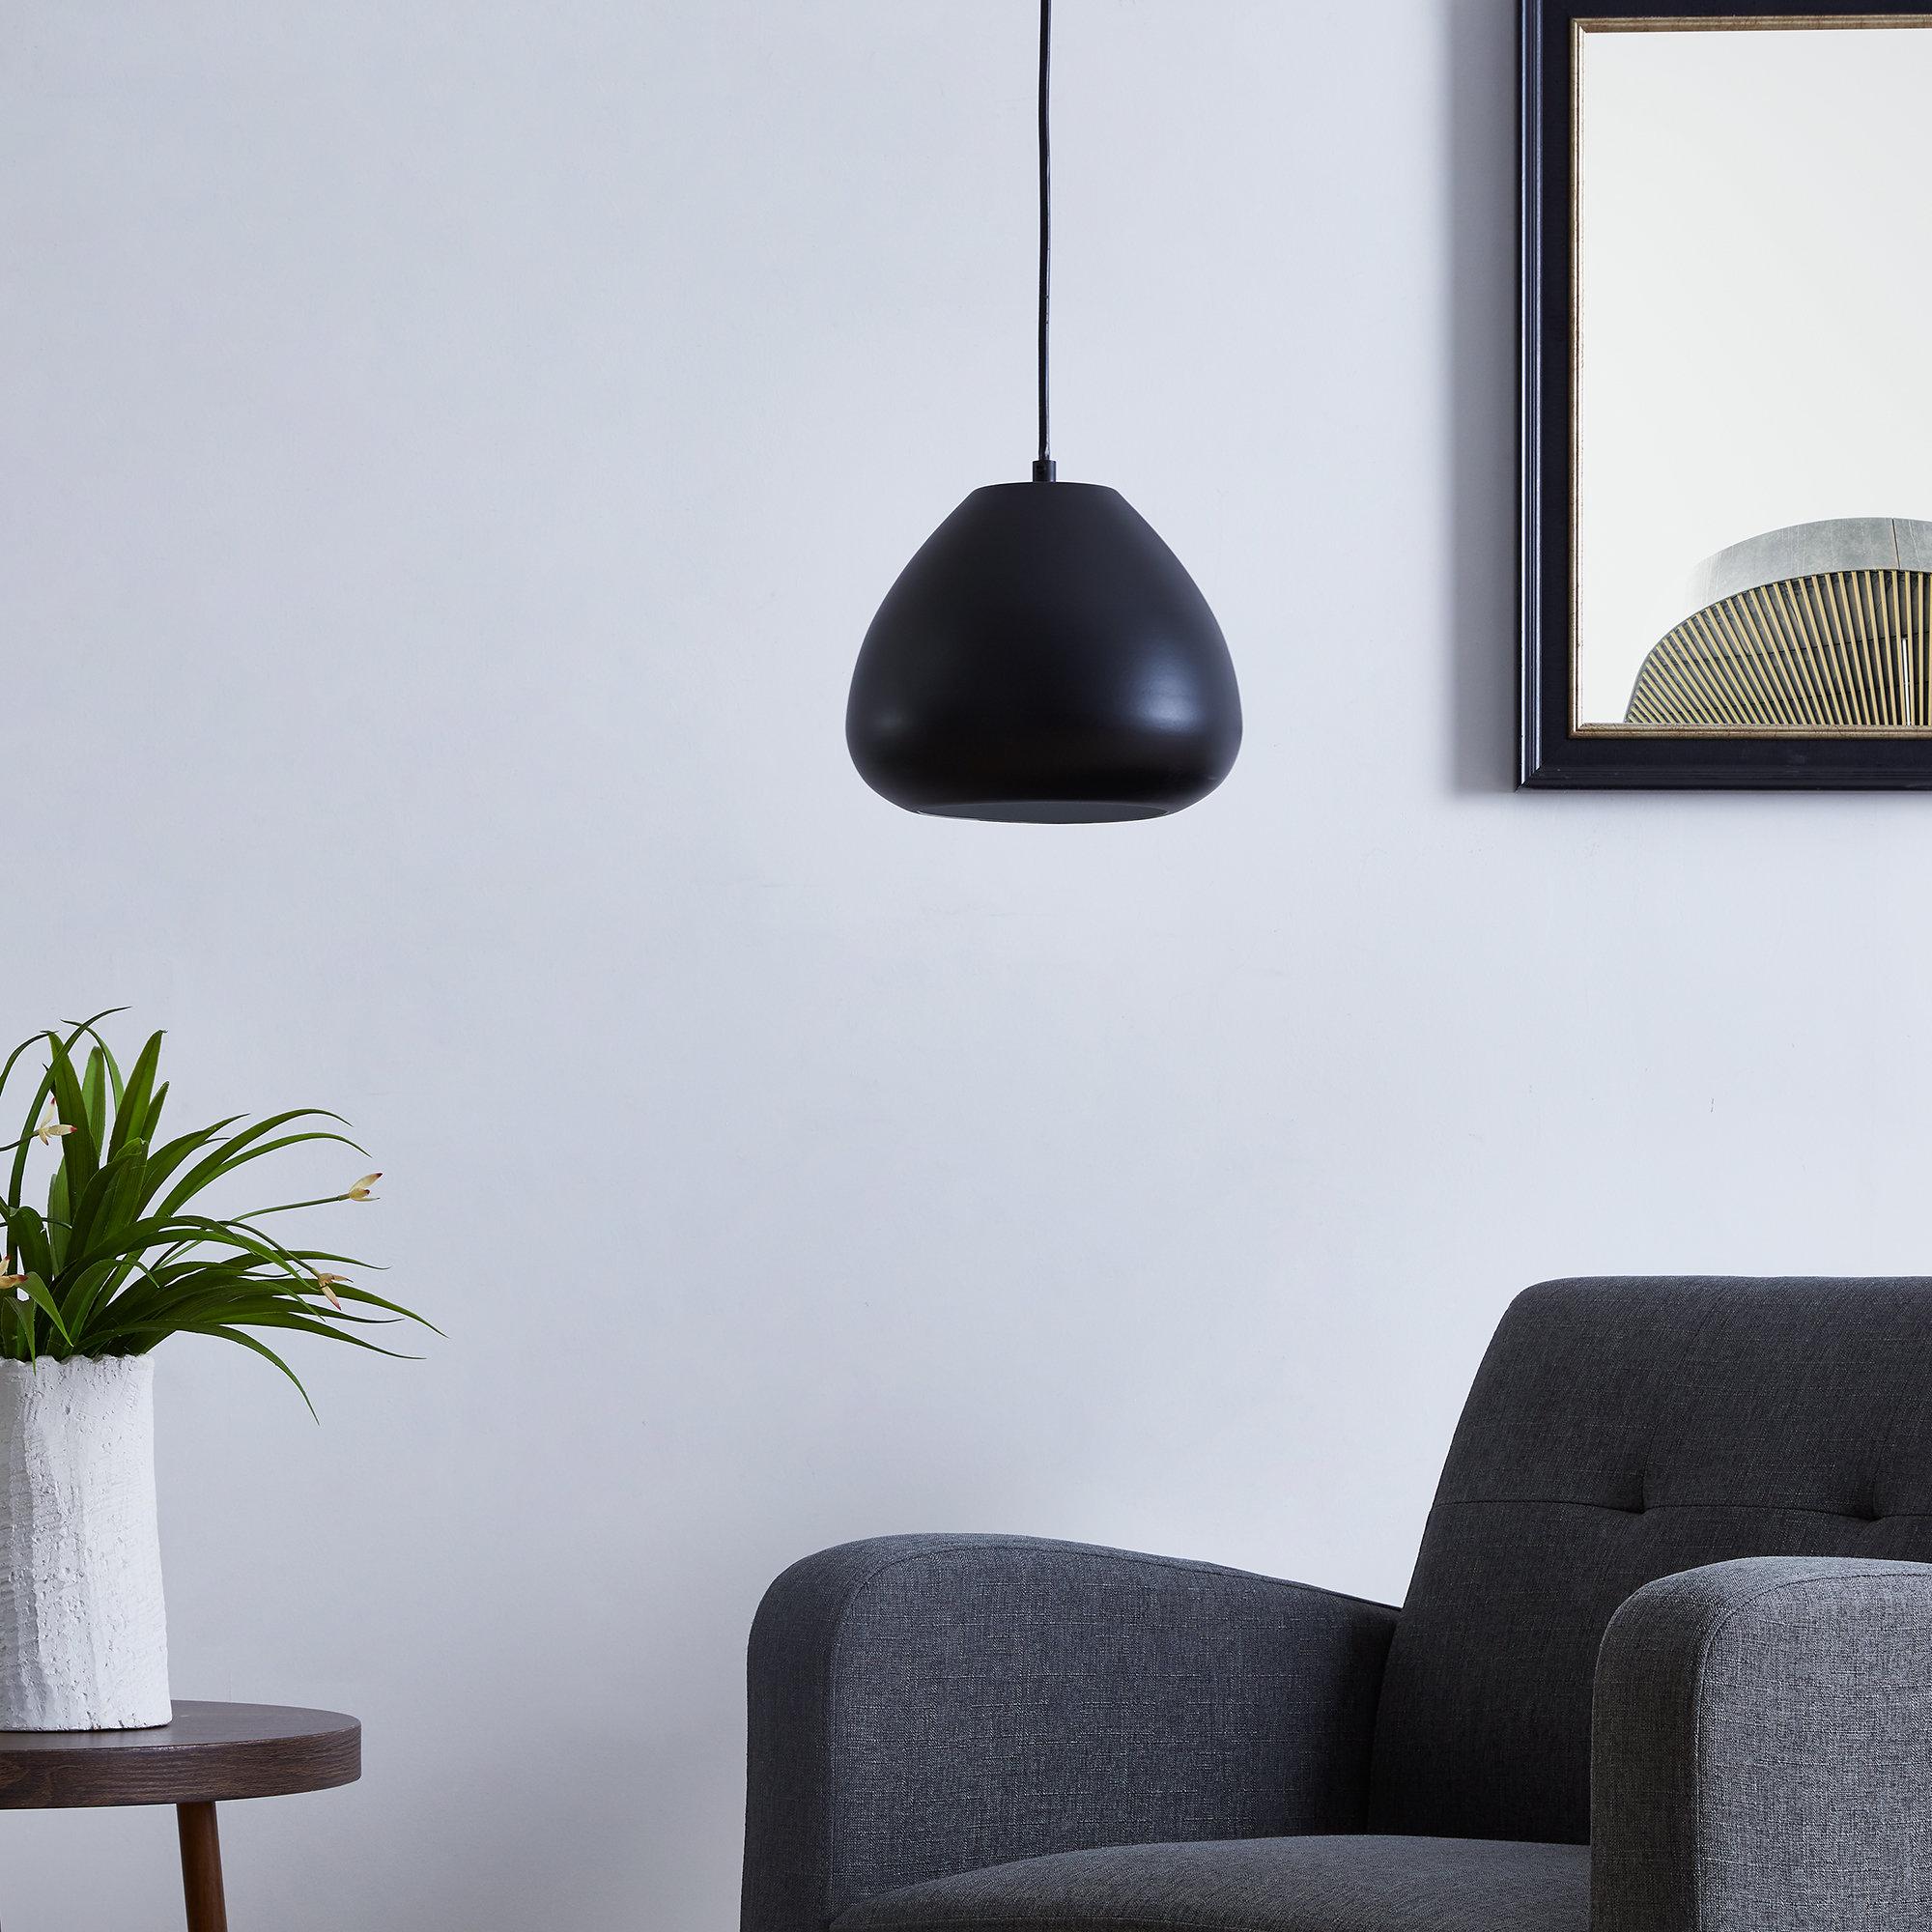 2019 Thomasson 1 Light Single Dome Pendant Inside Ryker 1 Light Single Dome Pendants (View 5 of 20)